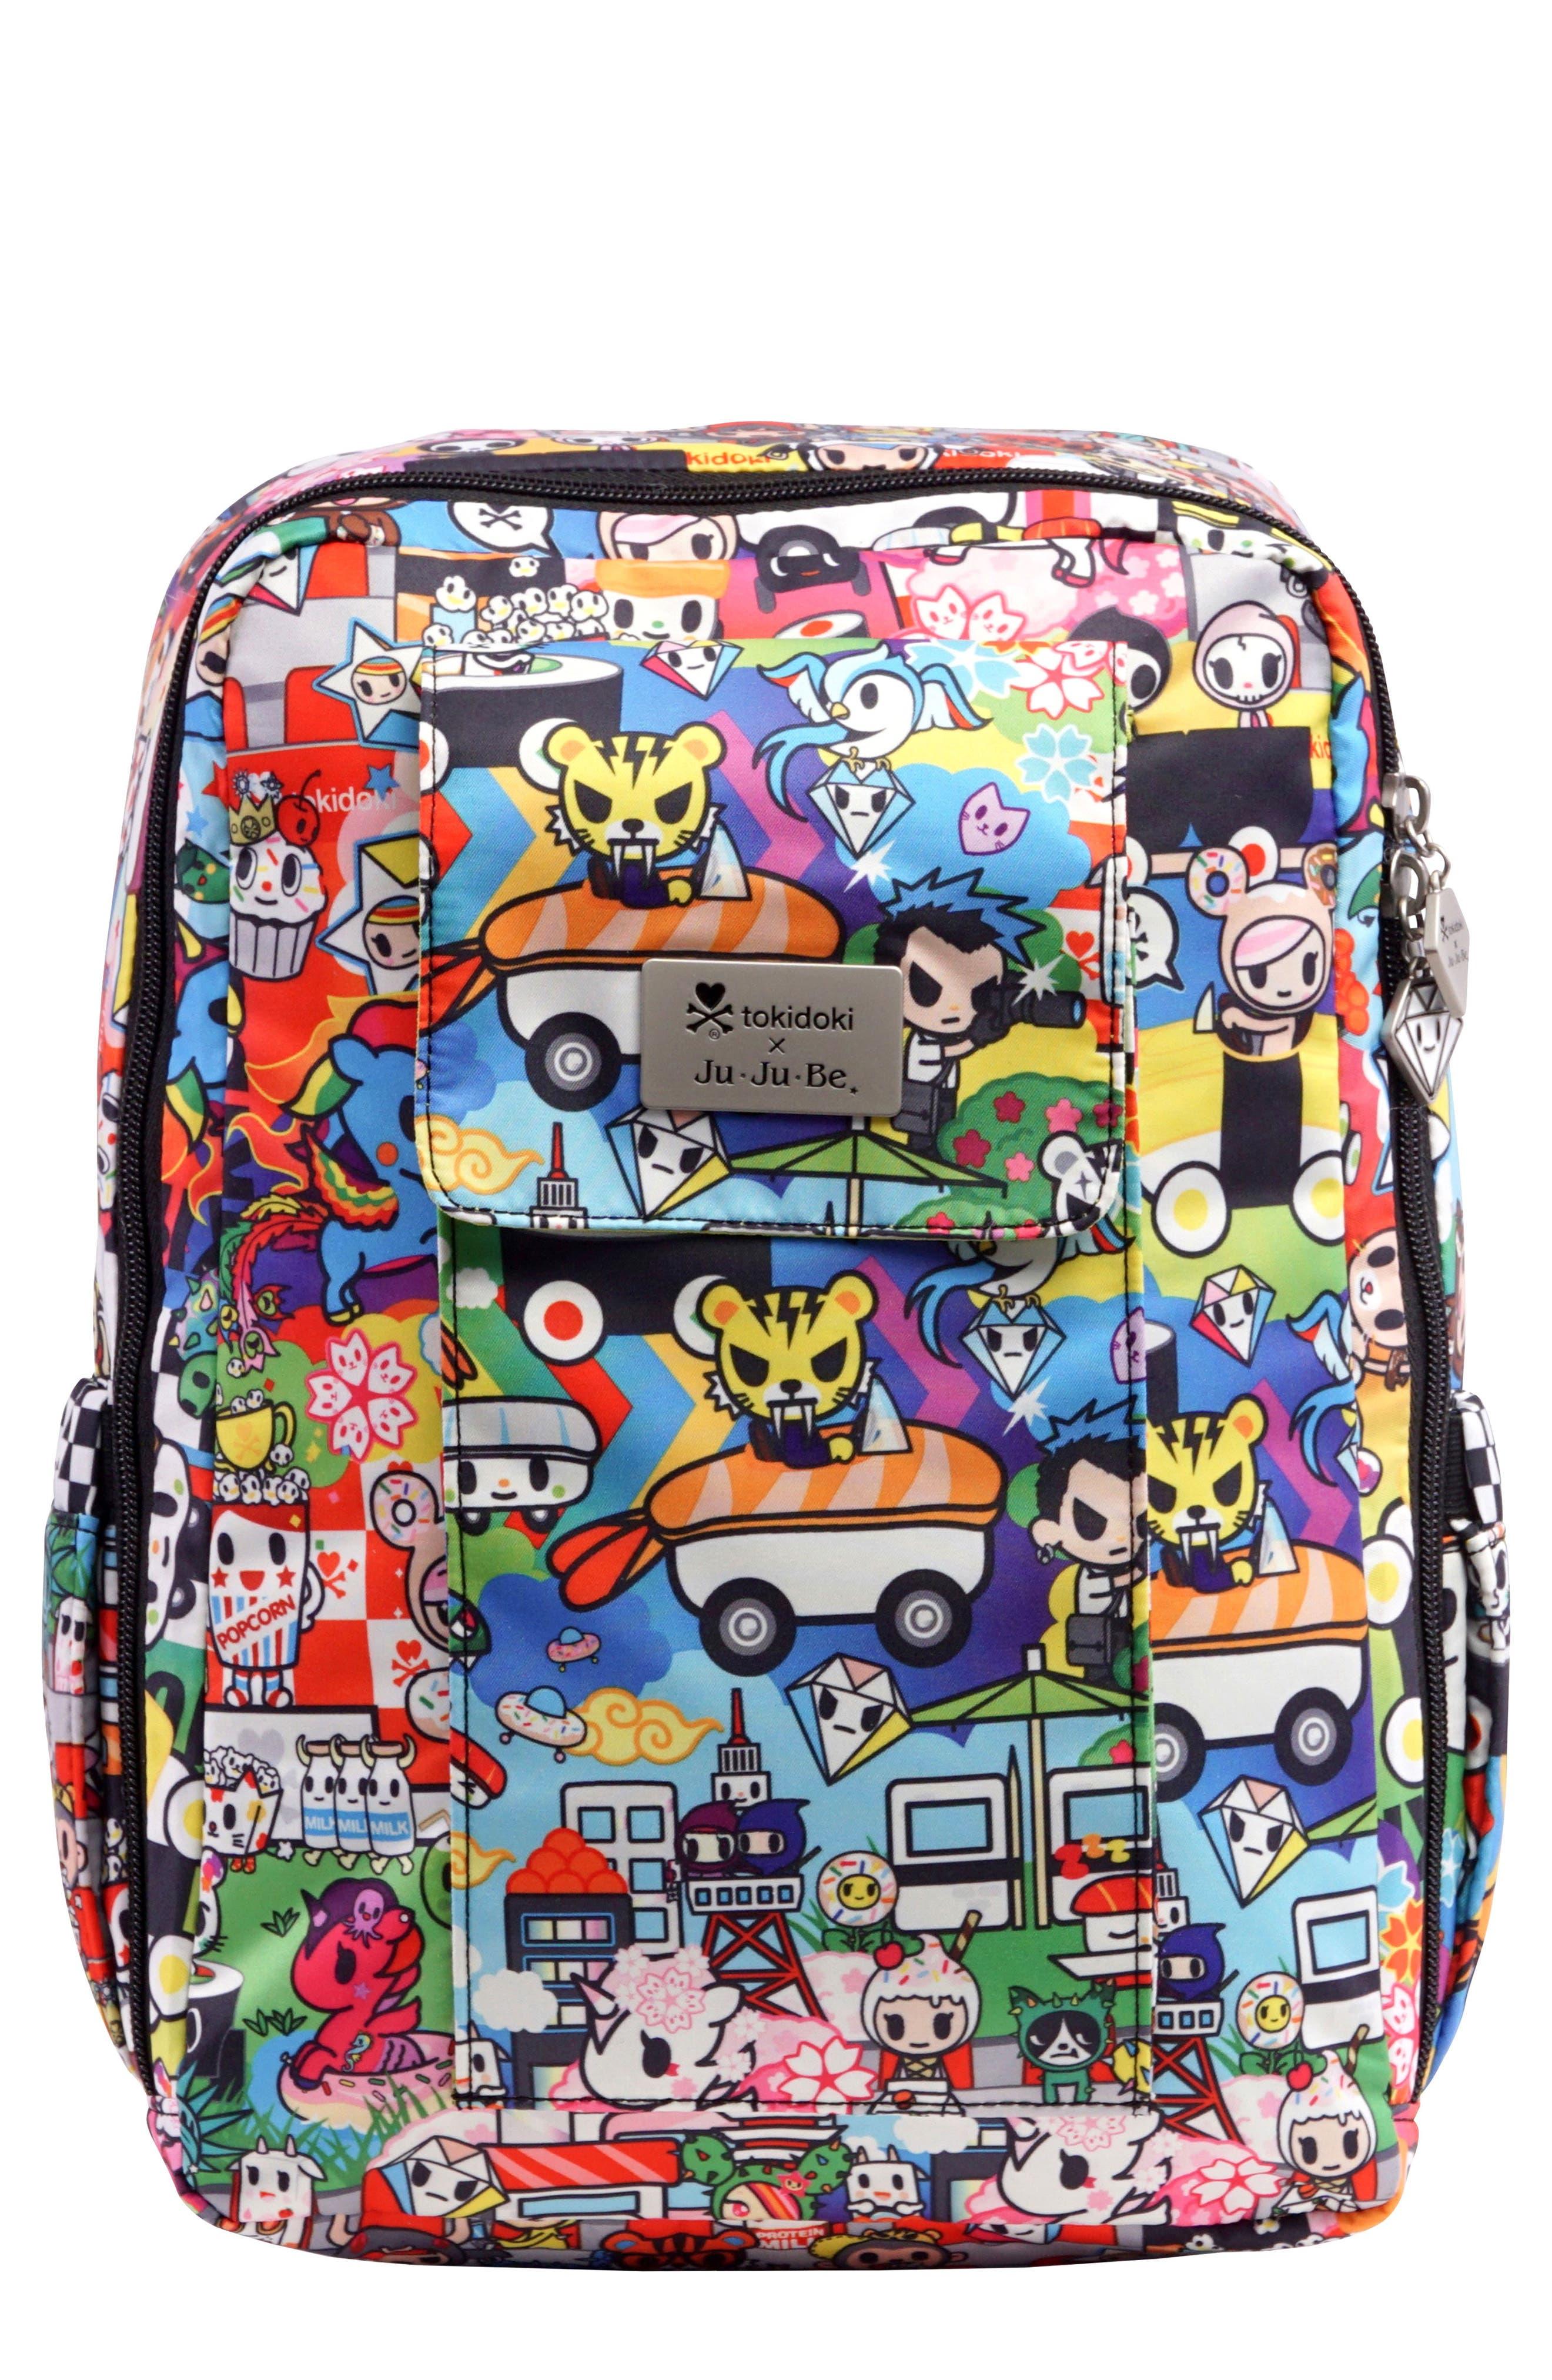 tokidoki x Ju-Ju-Be 'Mini Be' Backpack,                         Main,                         color, SUSHI CARS